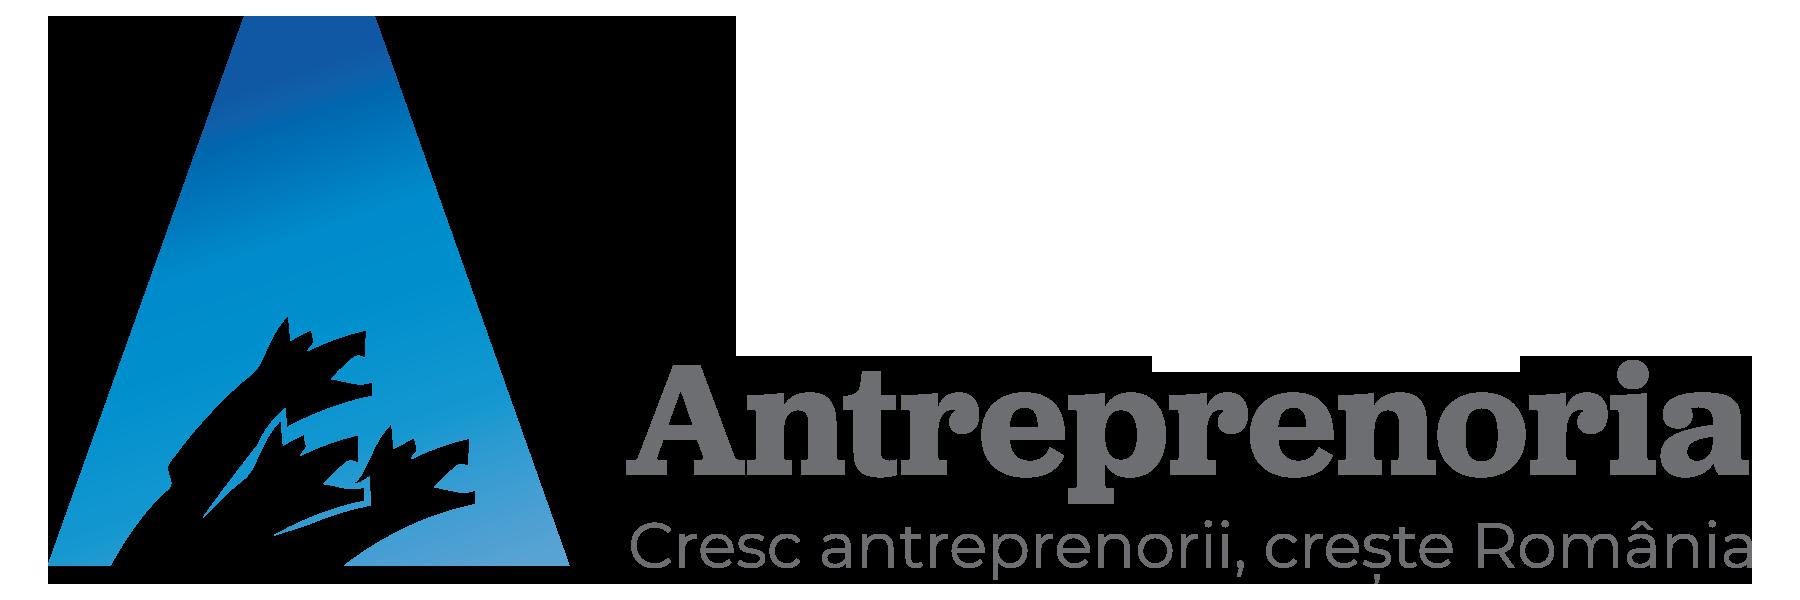 Antreprenoria